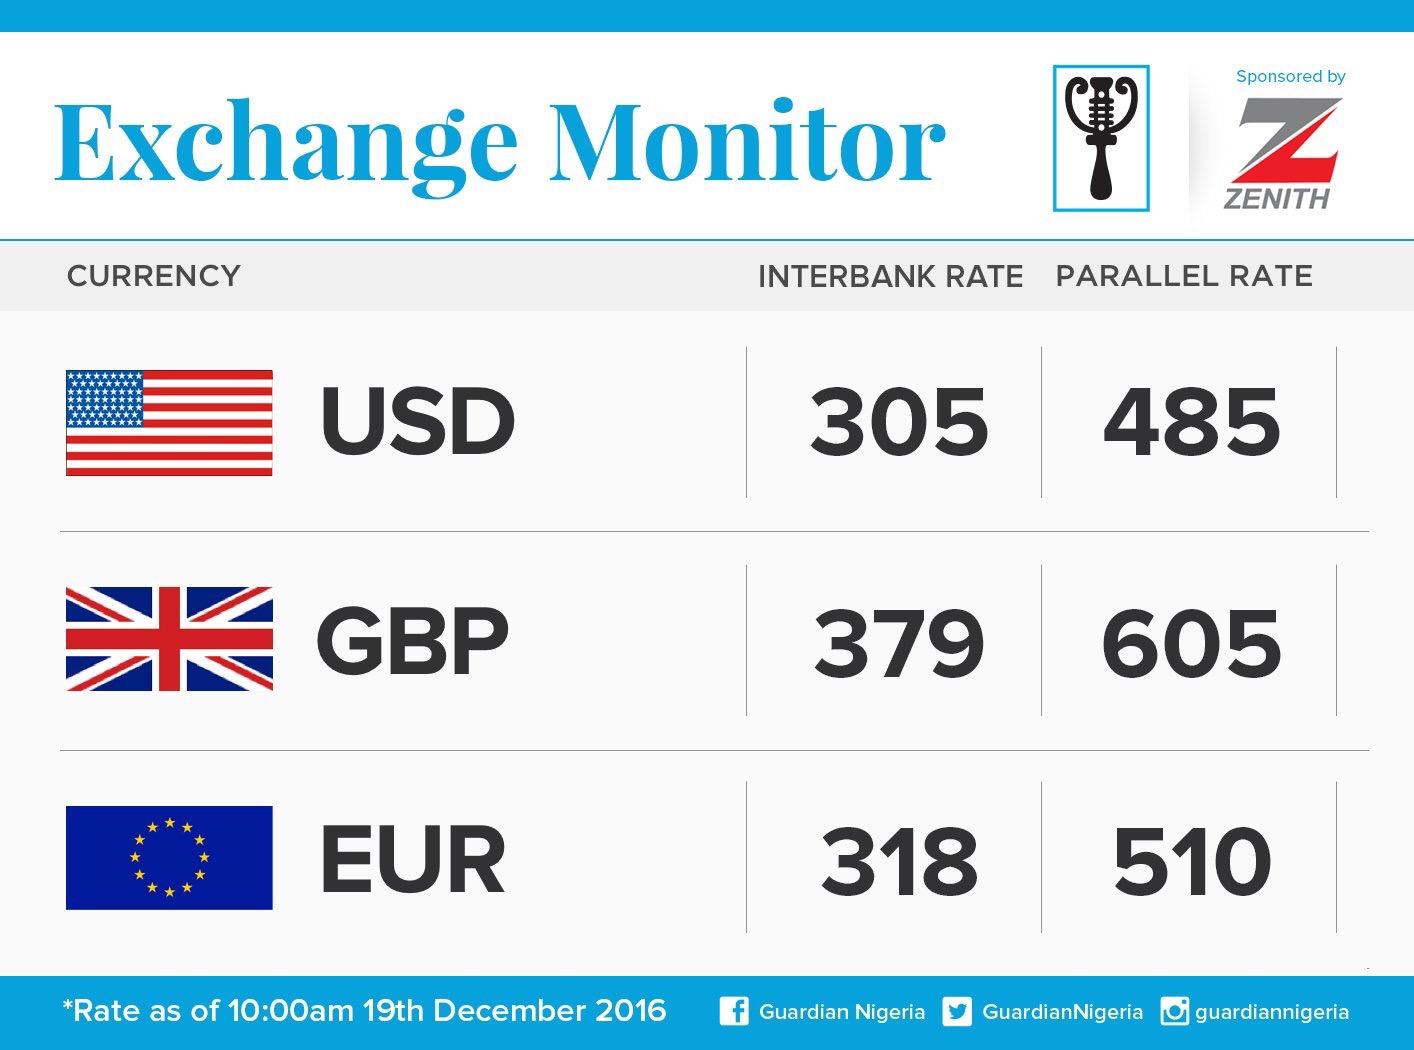 Exchange Rate afor 19th December 2016